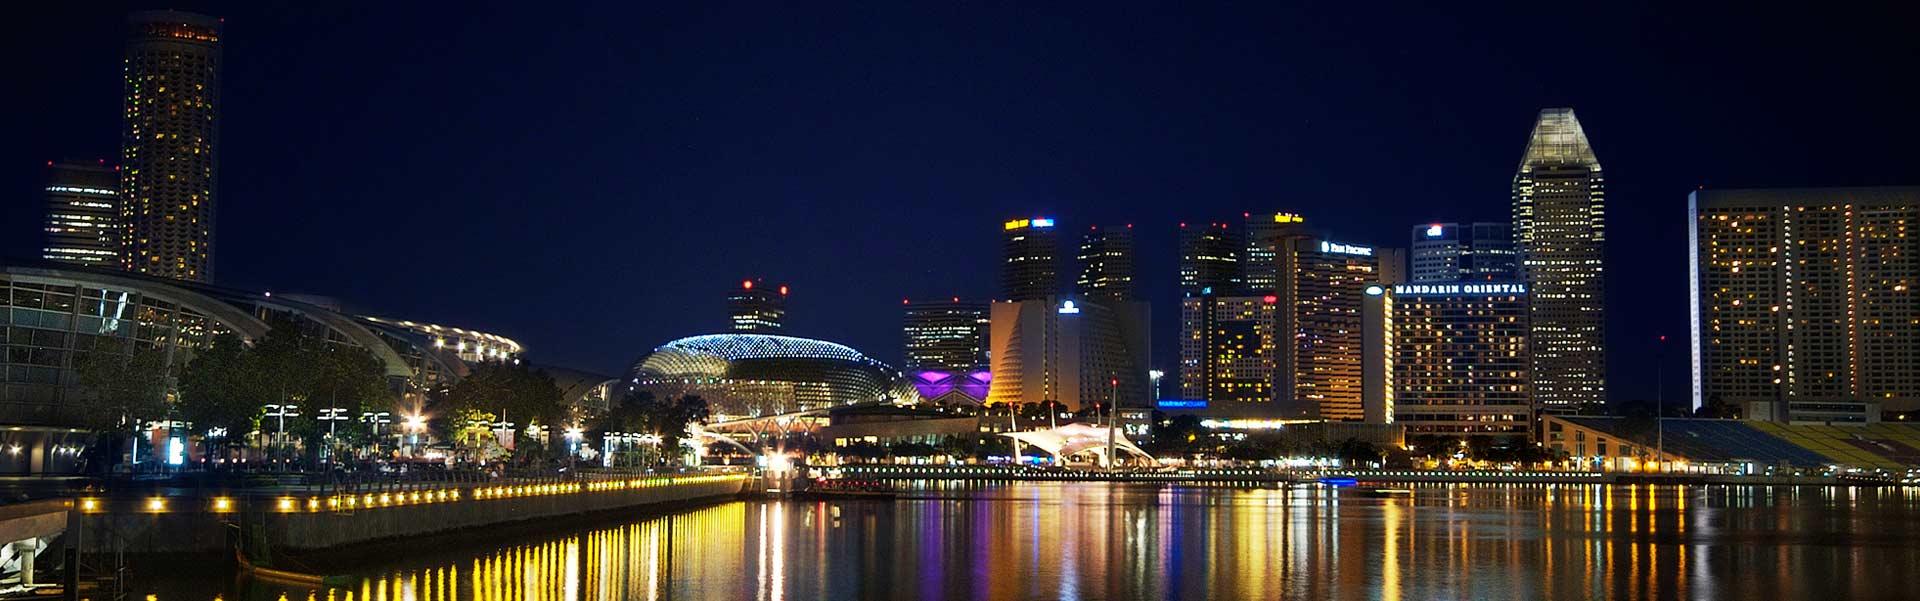 Freemasonry and Religion in Singapore